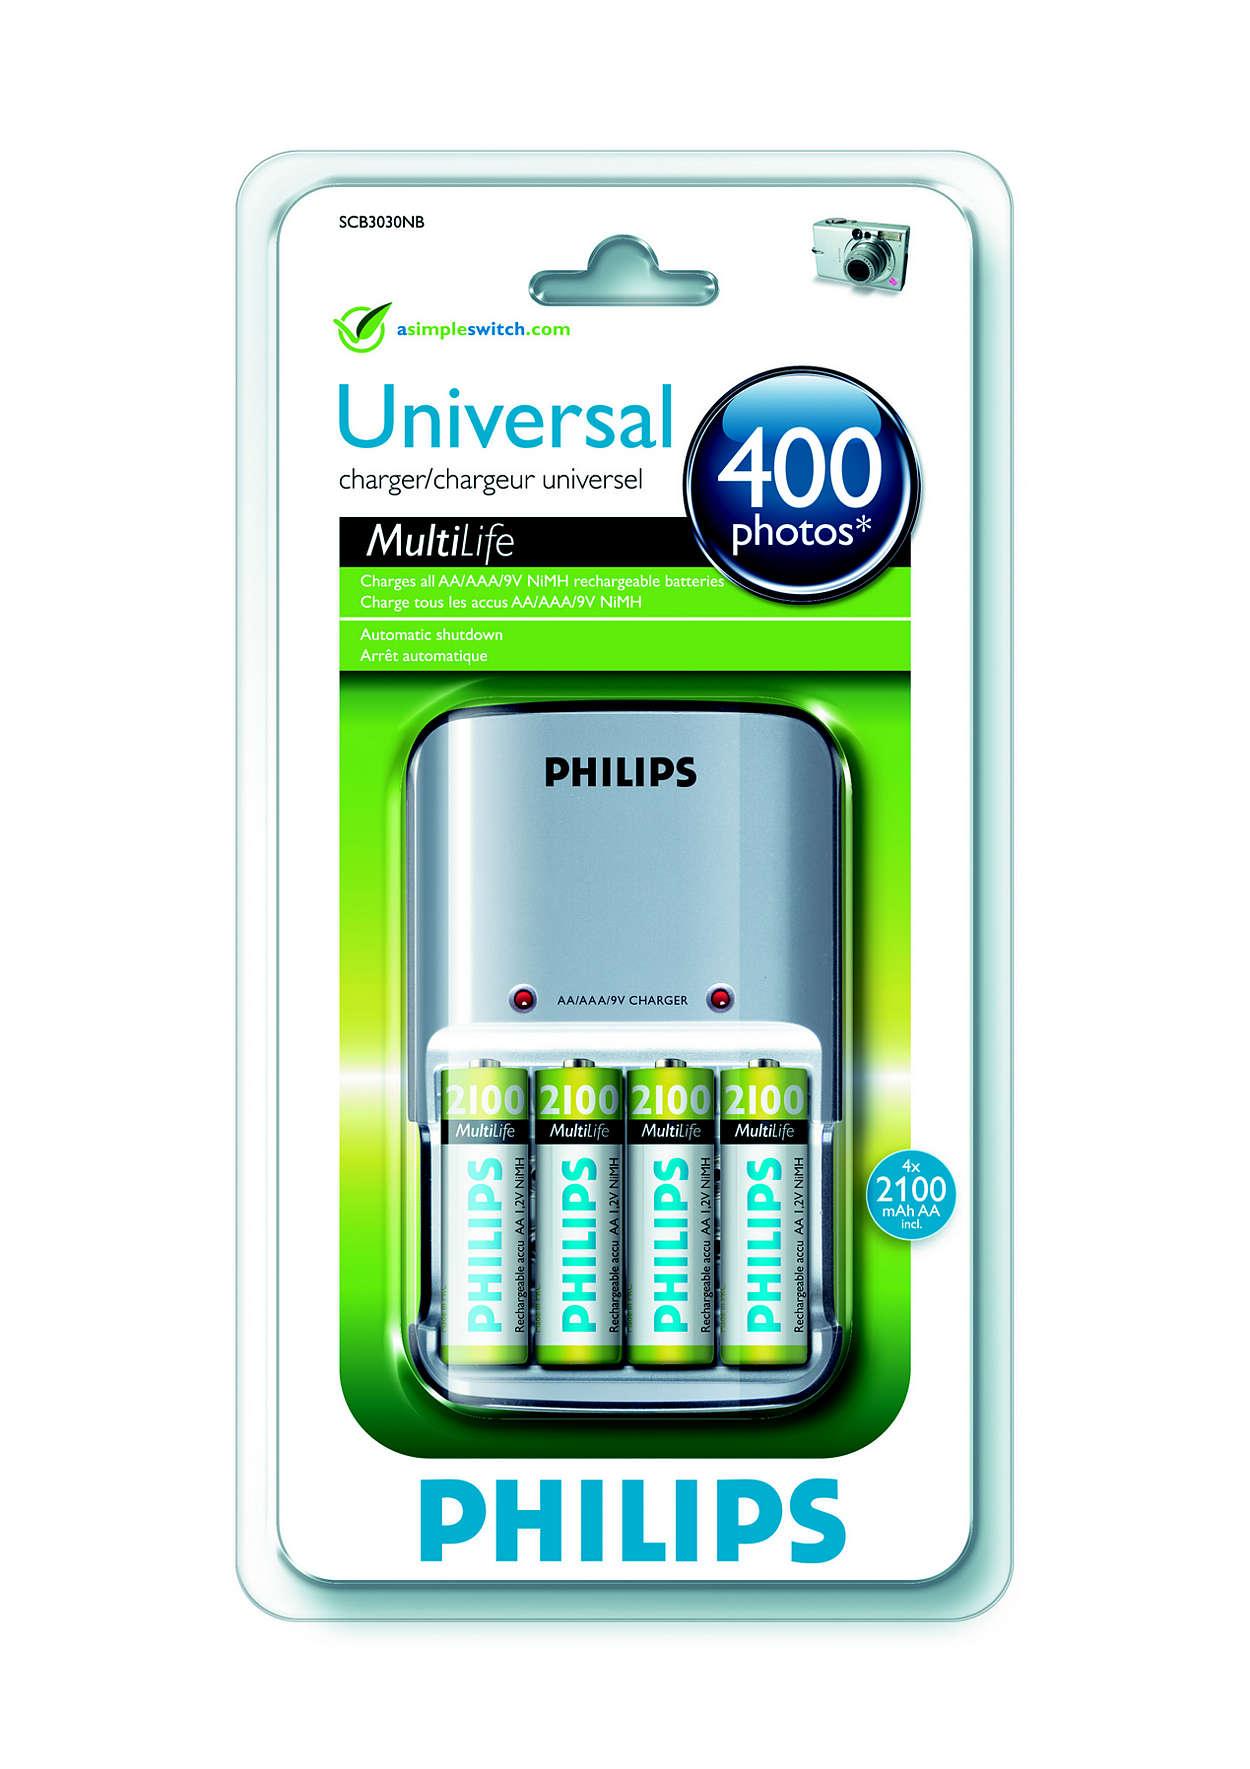 Ricarica tutte le batterie AA/AAA/9 V NiMH ricaricabili